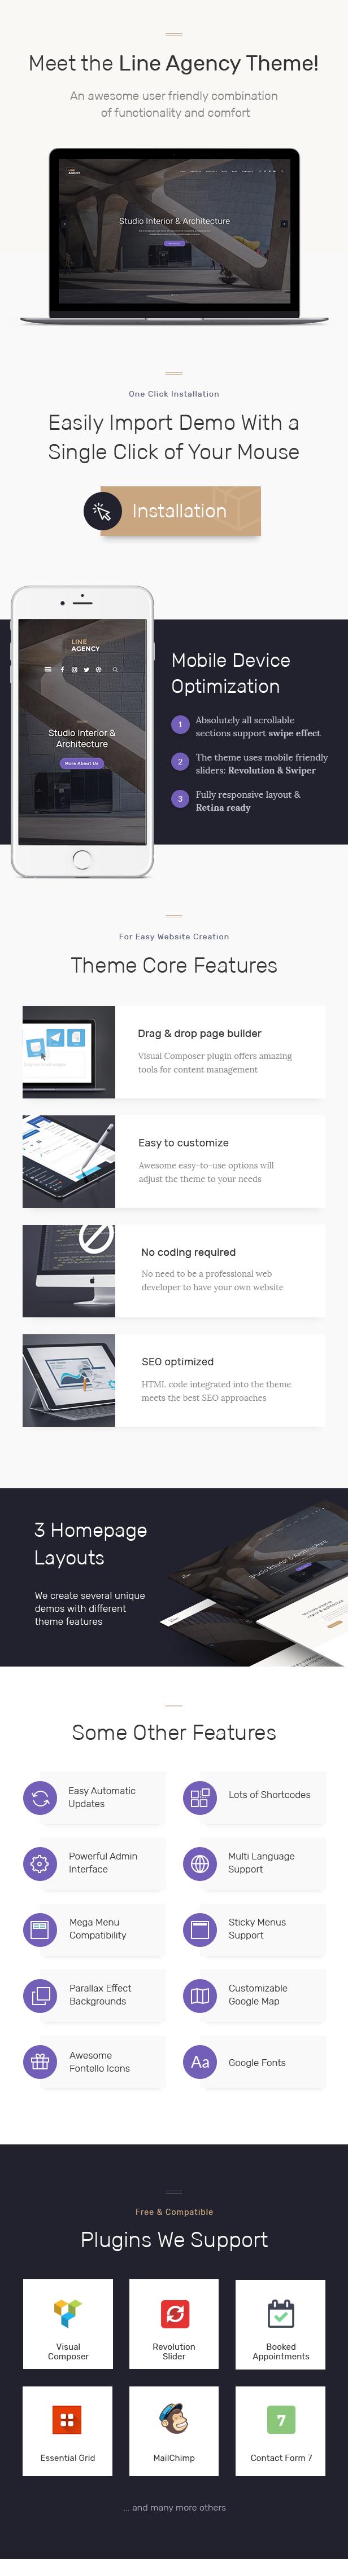 Line Agency | Interior Design & Architecture WordPress Theme - 2